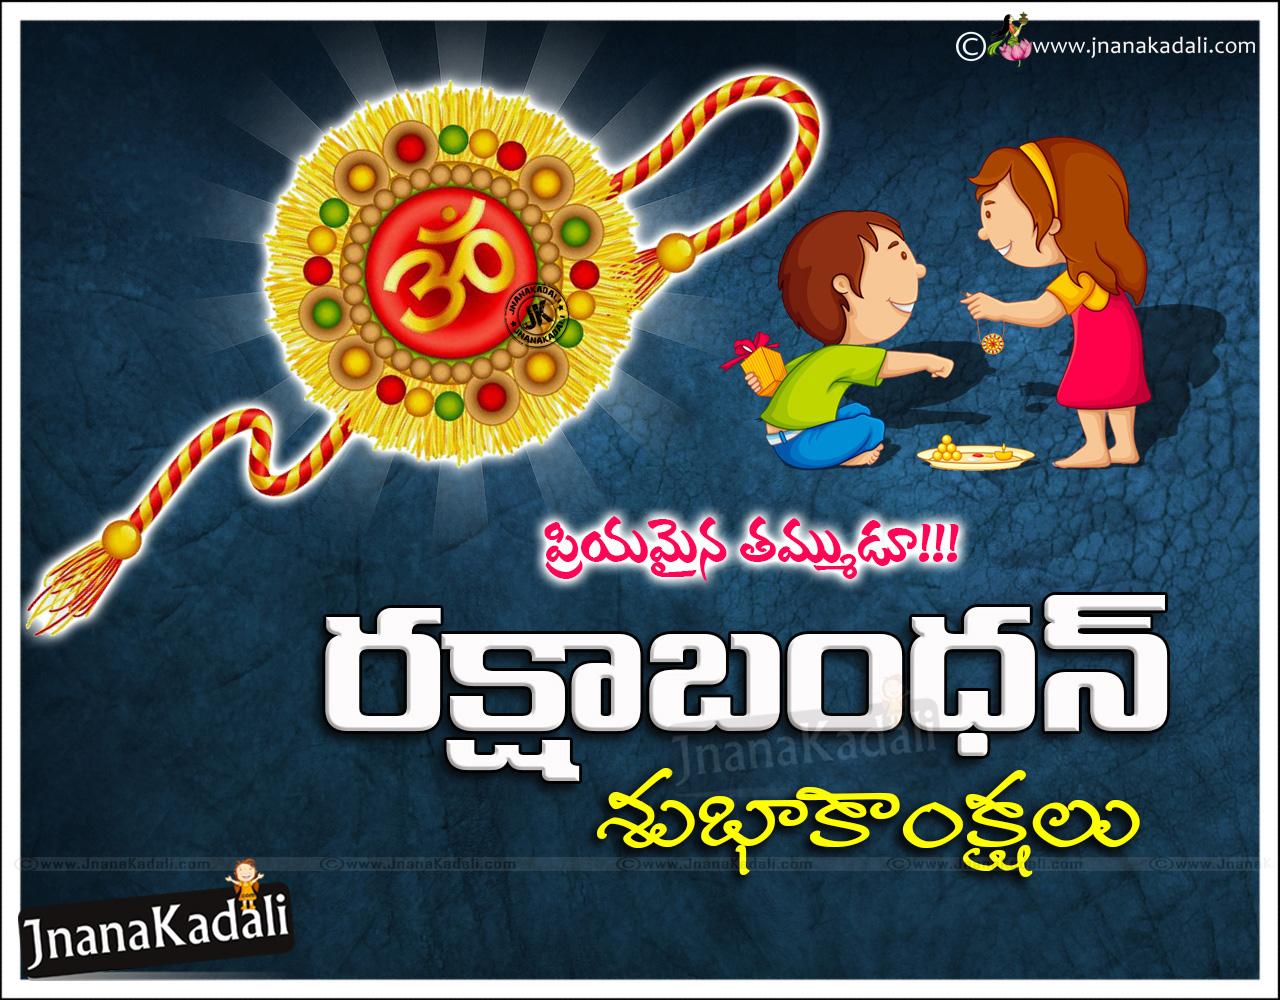 Rakhi Festival Quotes Brother: Best Telugu Rakhi Festival Quotes Greetings For Sister